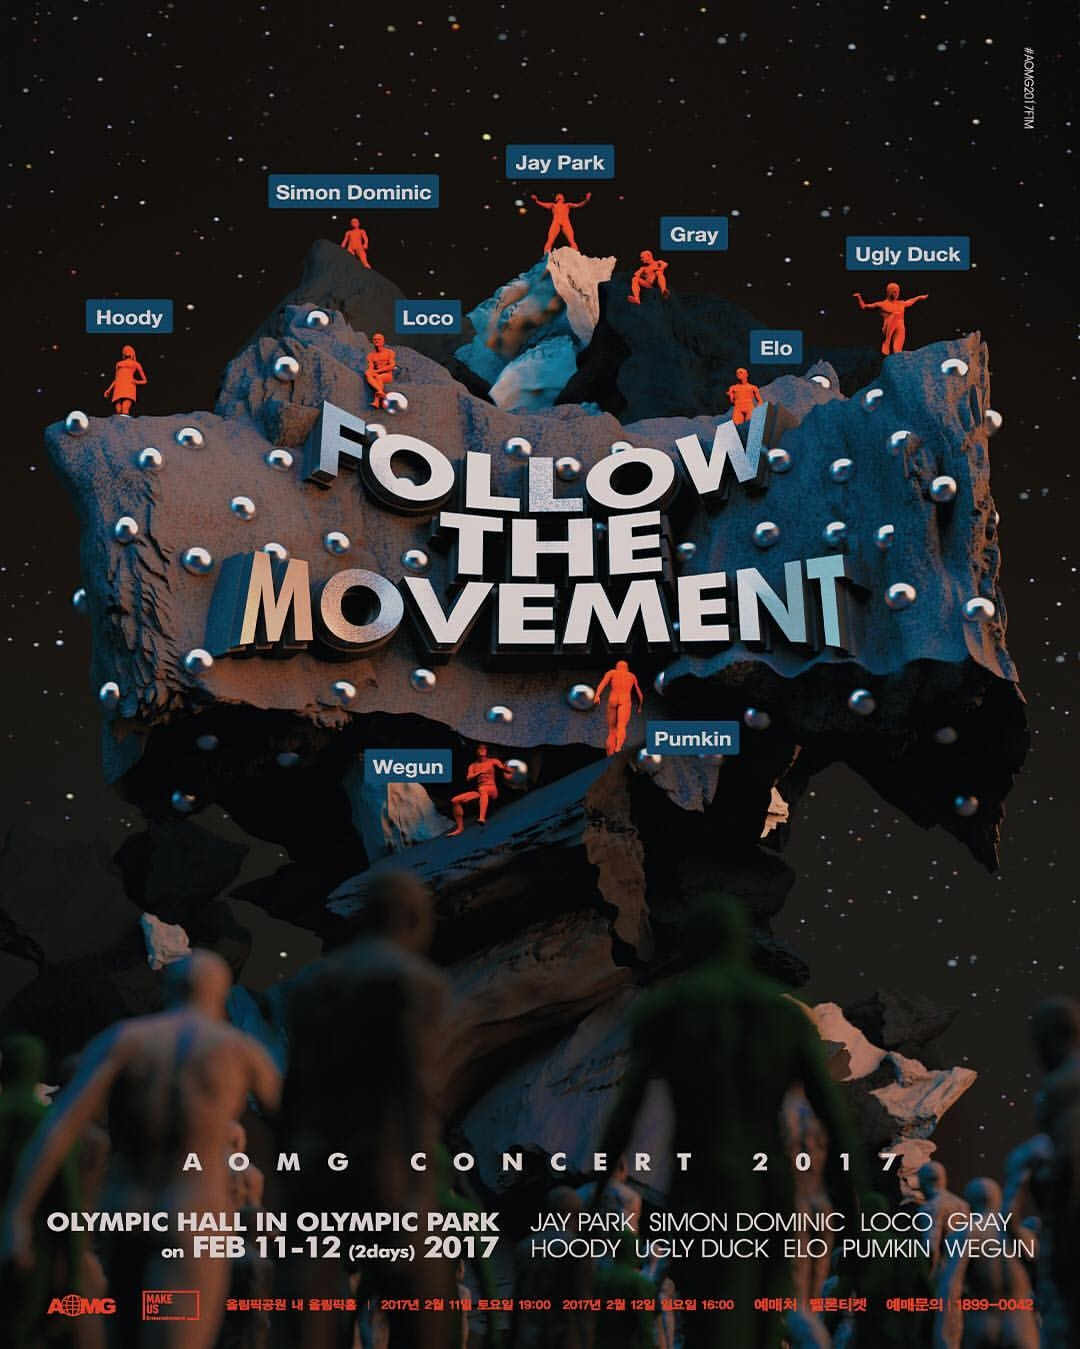 Follow The Movement